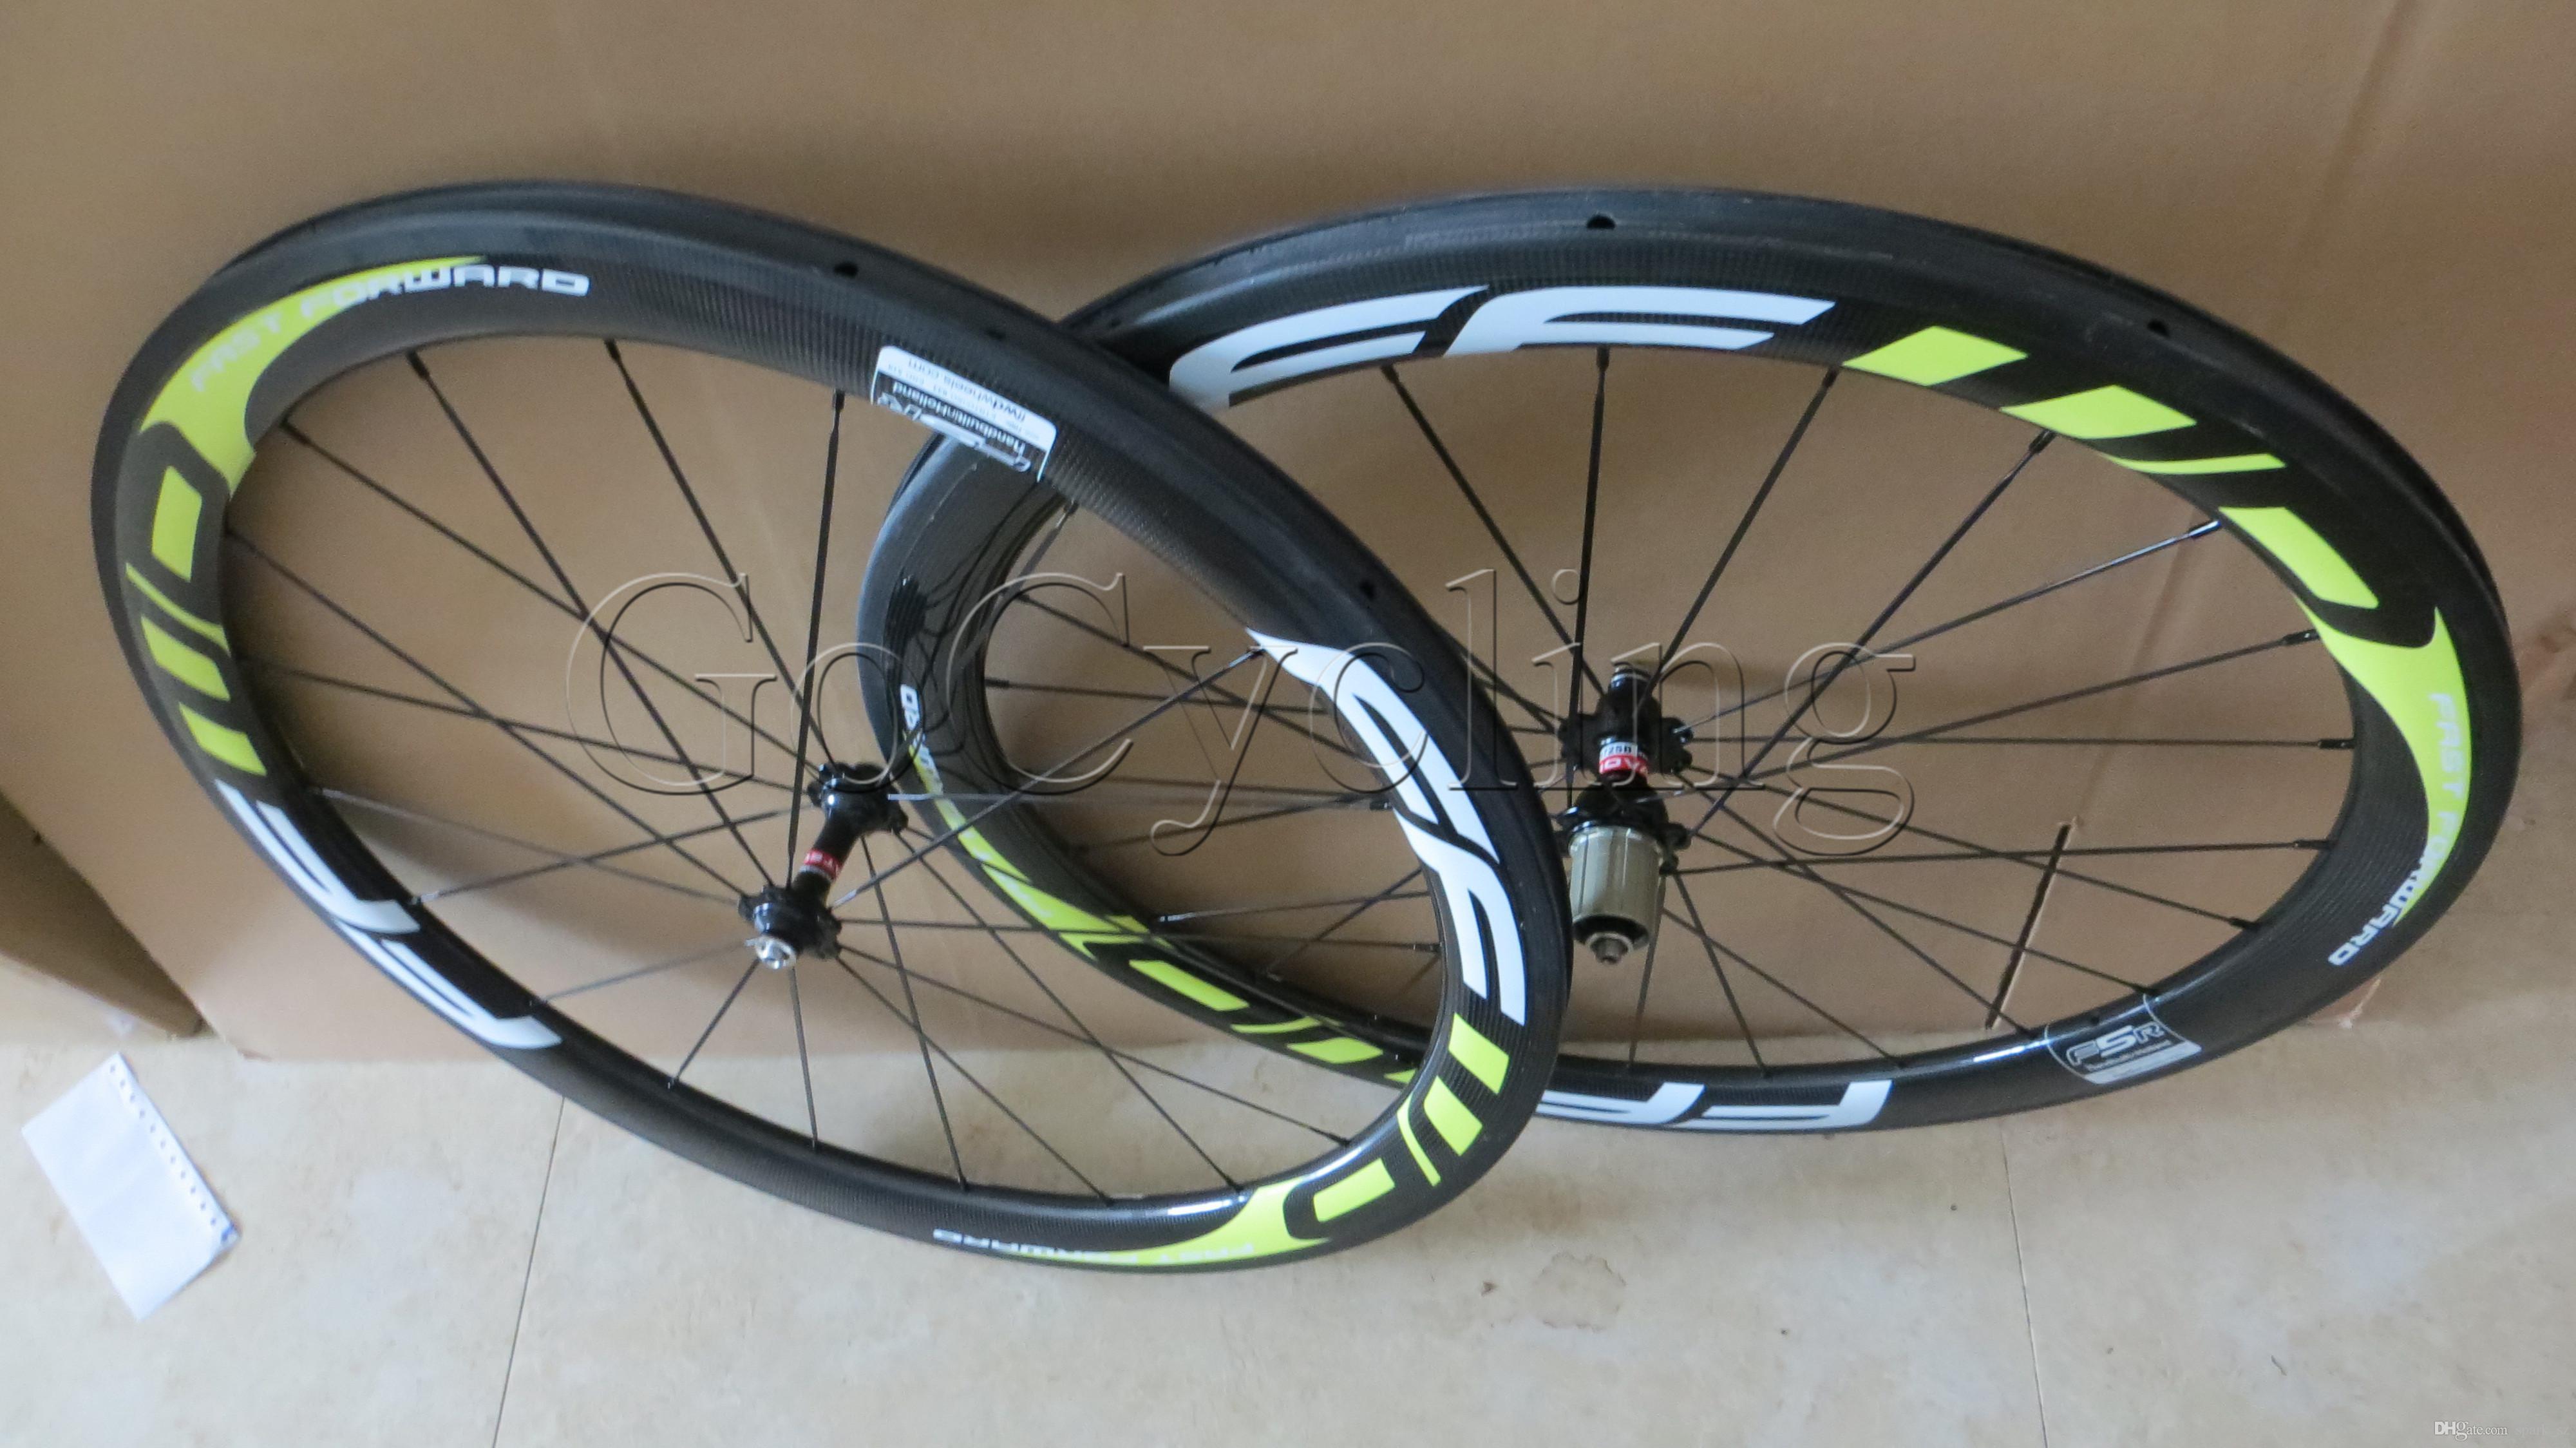 FFWD fast forward F5R white Yellow decals 50mm clincher tubular road cycling bike wheelset basalt brake surface rim width 27mm 3k matt